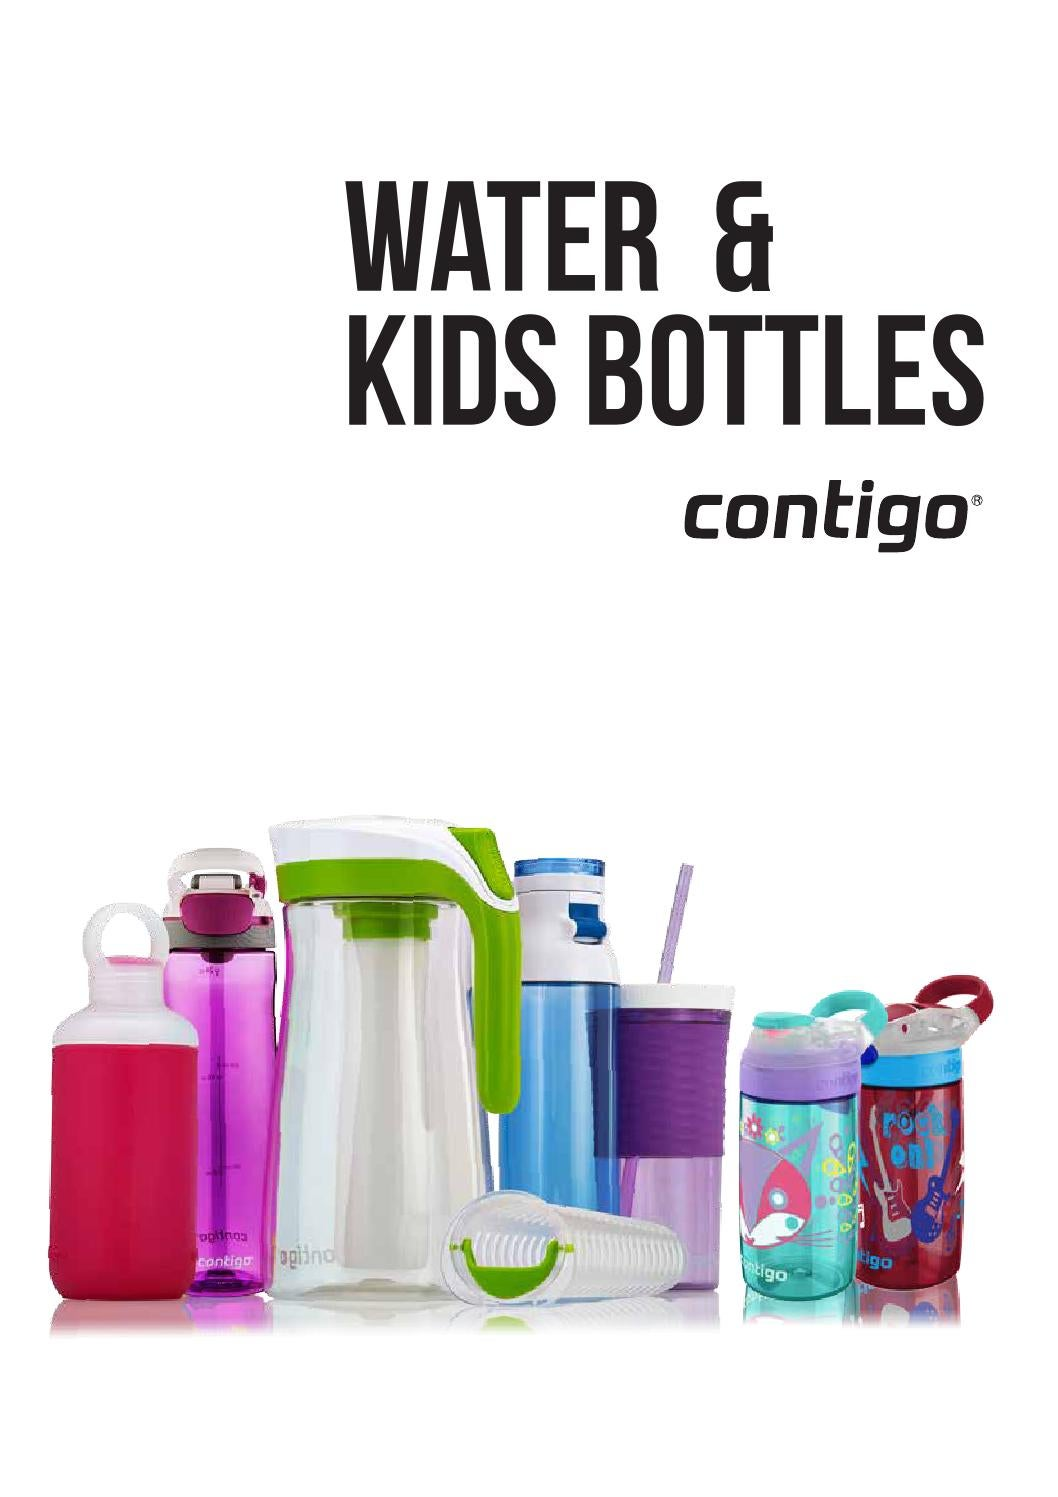 NEW CONTIGO SWISH AUTOSEAL BOTTLE WATER BPA FREE LEAK PROOF DRINK CHILDREN LID